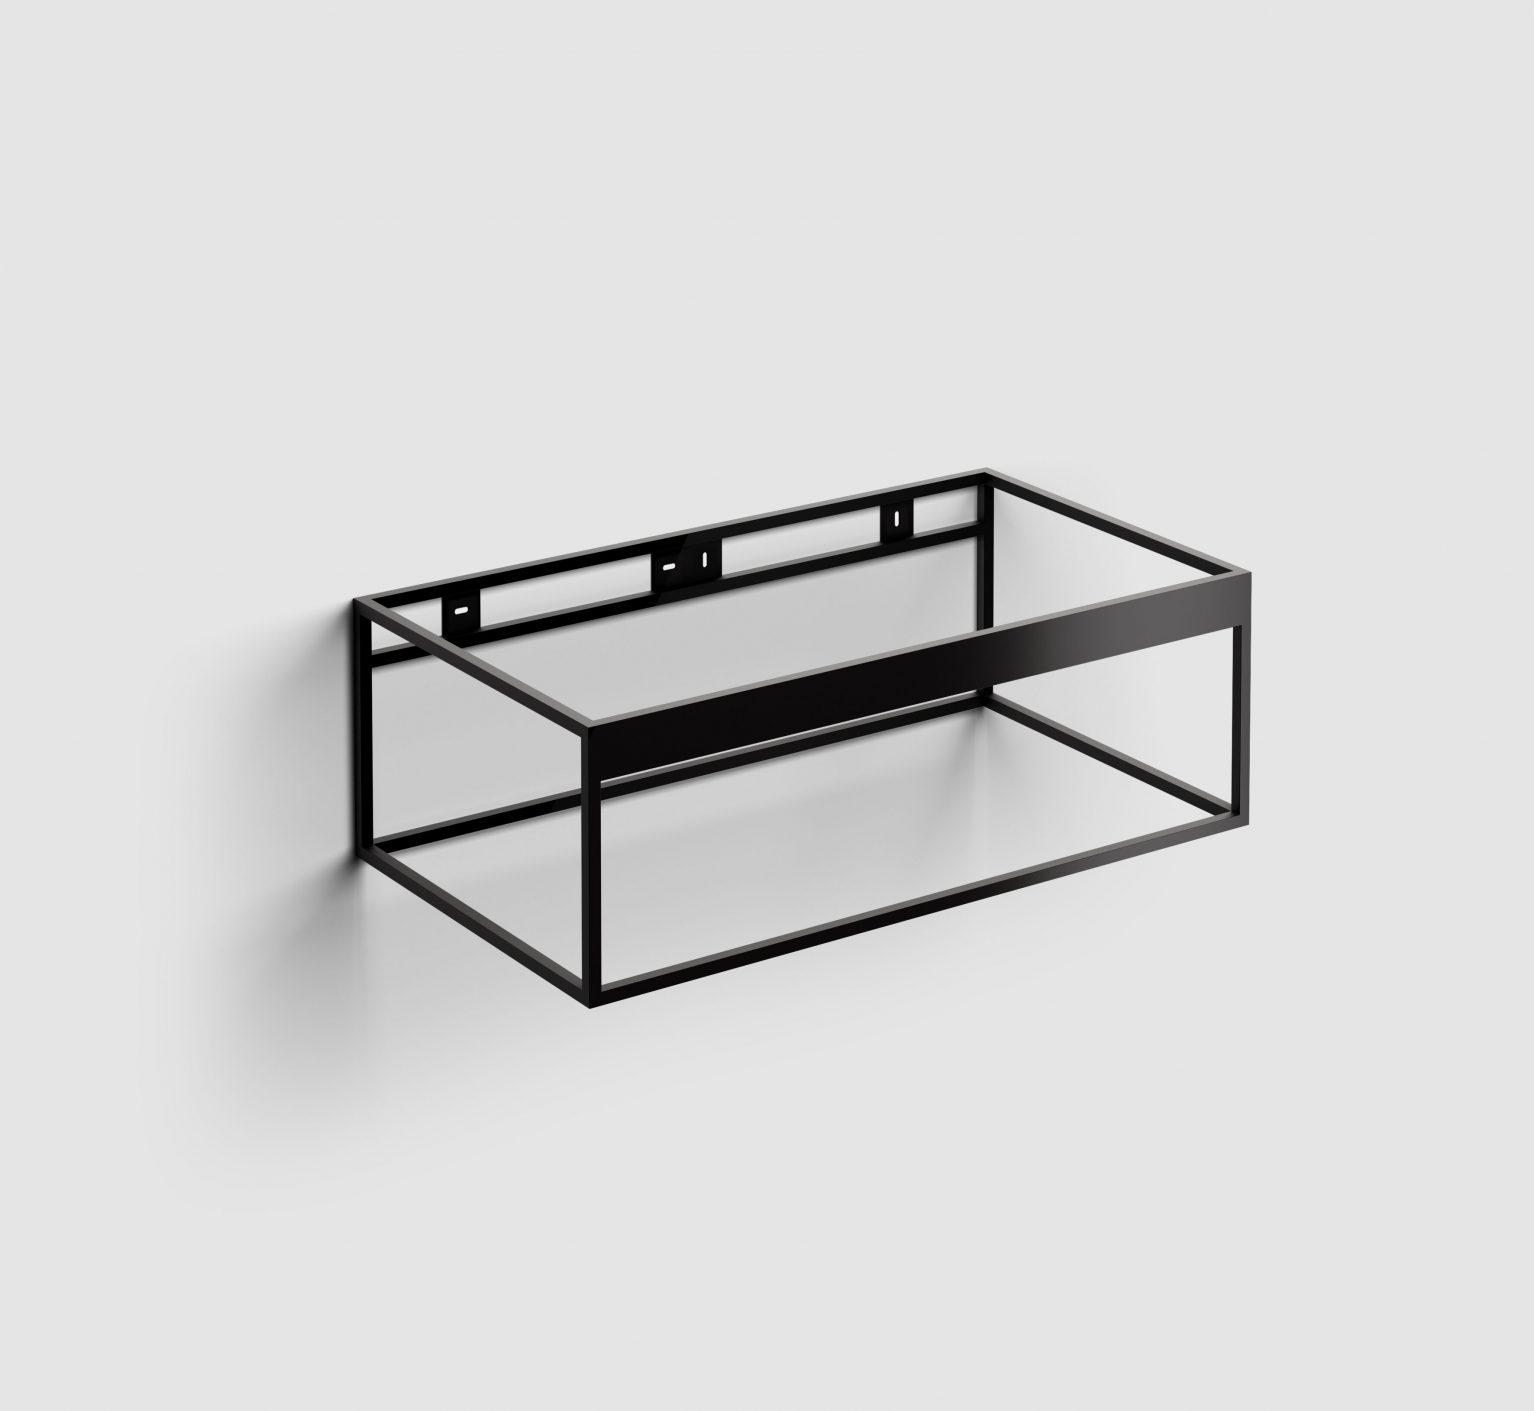 Hammock Frame rvs kokerprofielkast 90 cm, mat zwart poederc.)